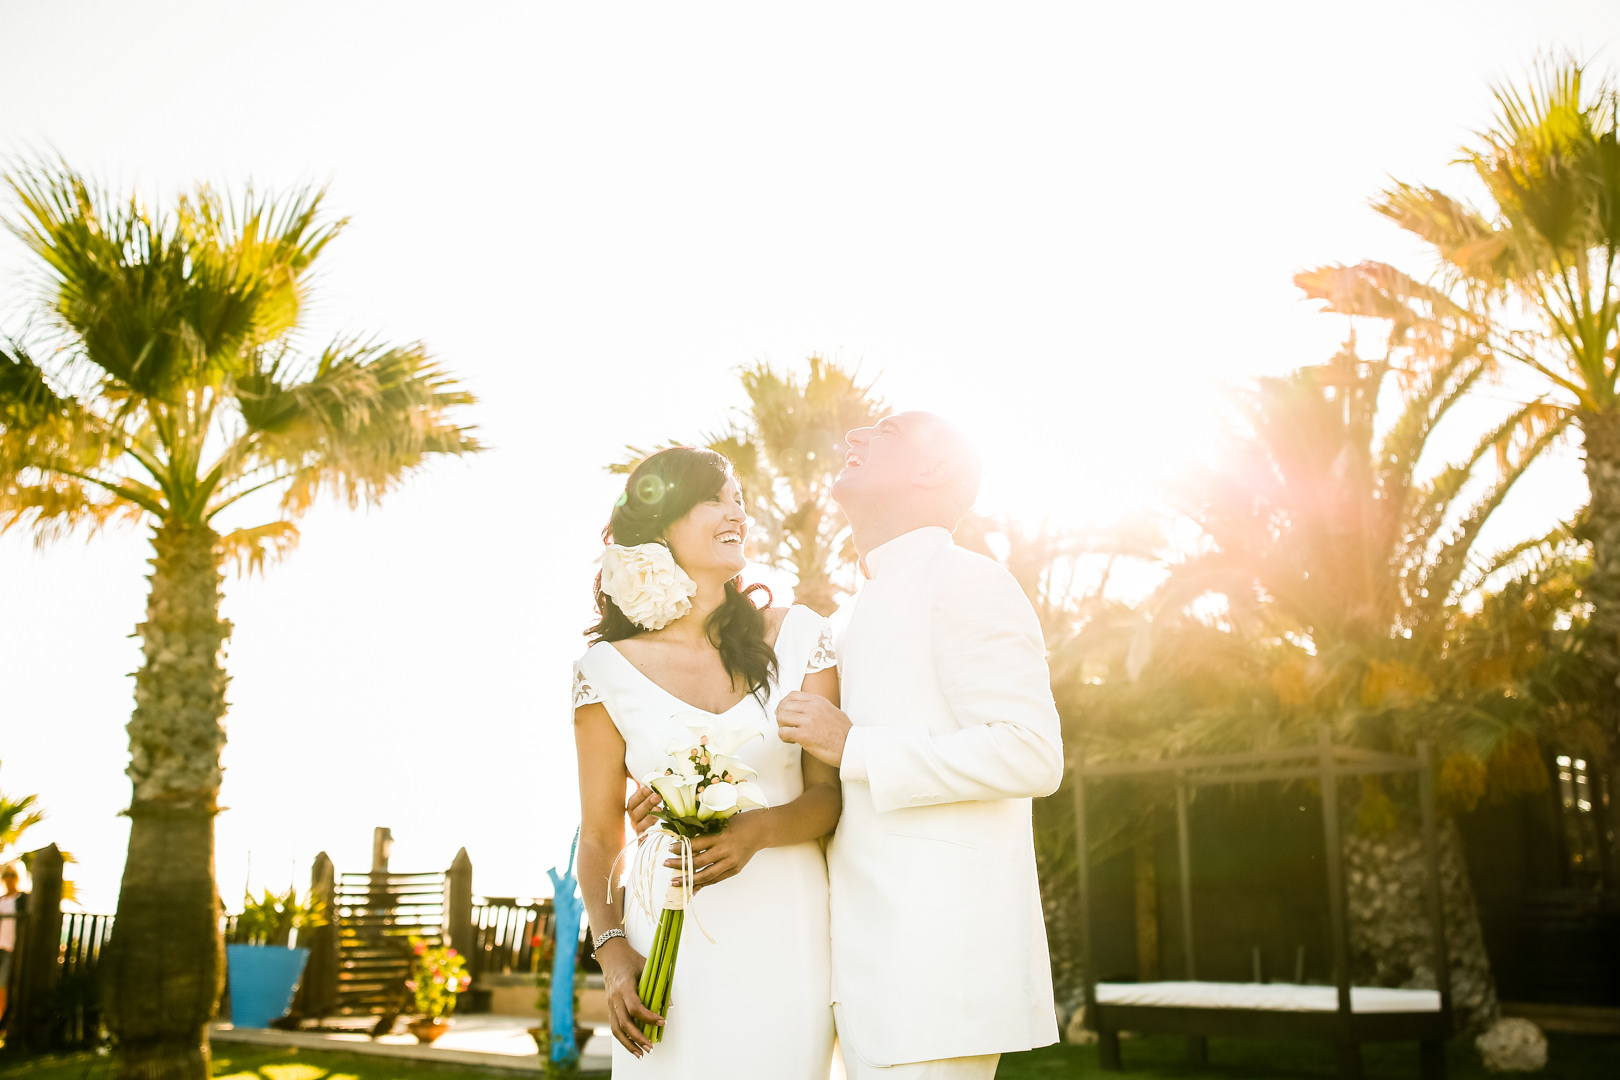 Boda-Sajorami-Beach-Cadiz-Zahora-Pedro-Gema-engagement-Rafael-Torres-fotografo-bodas-sevilla-madrid-barcelona-wedding-photographer--38.jpg